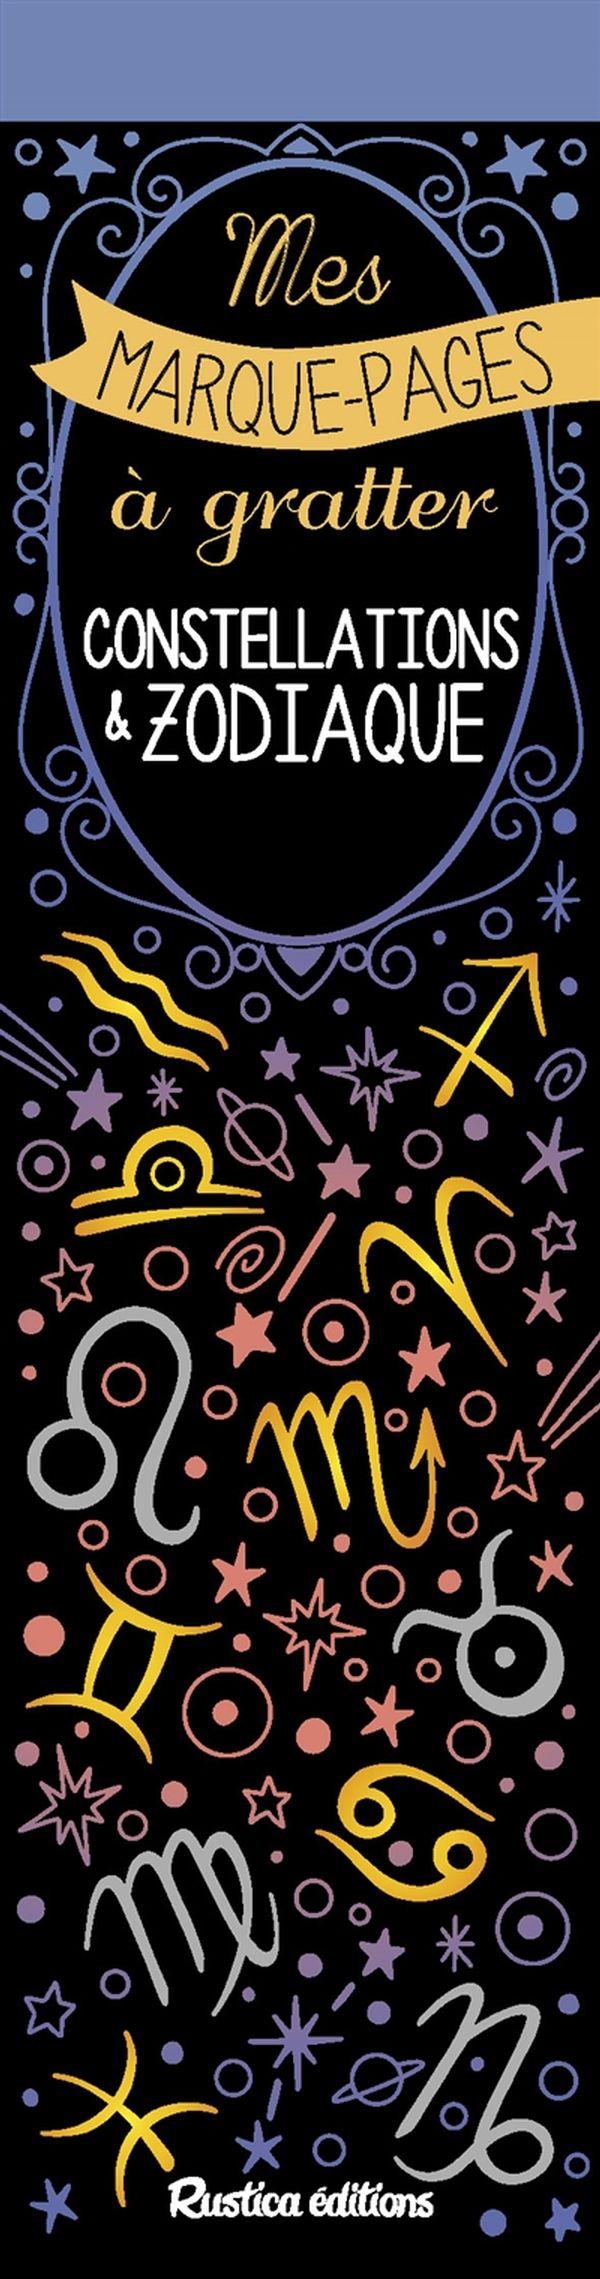 Constellations et zodiaques